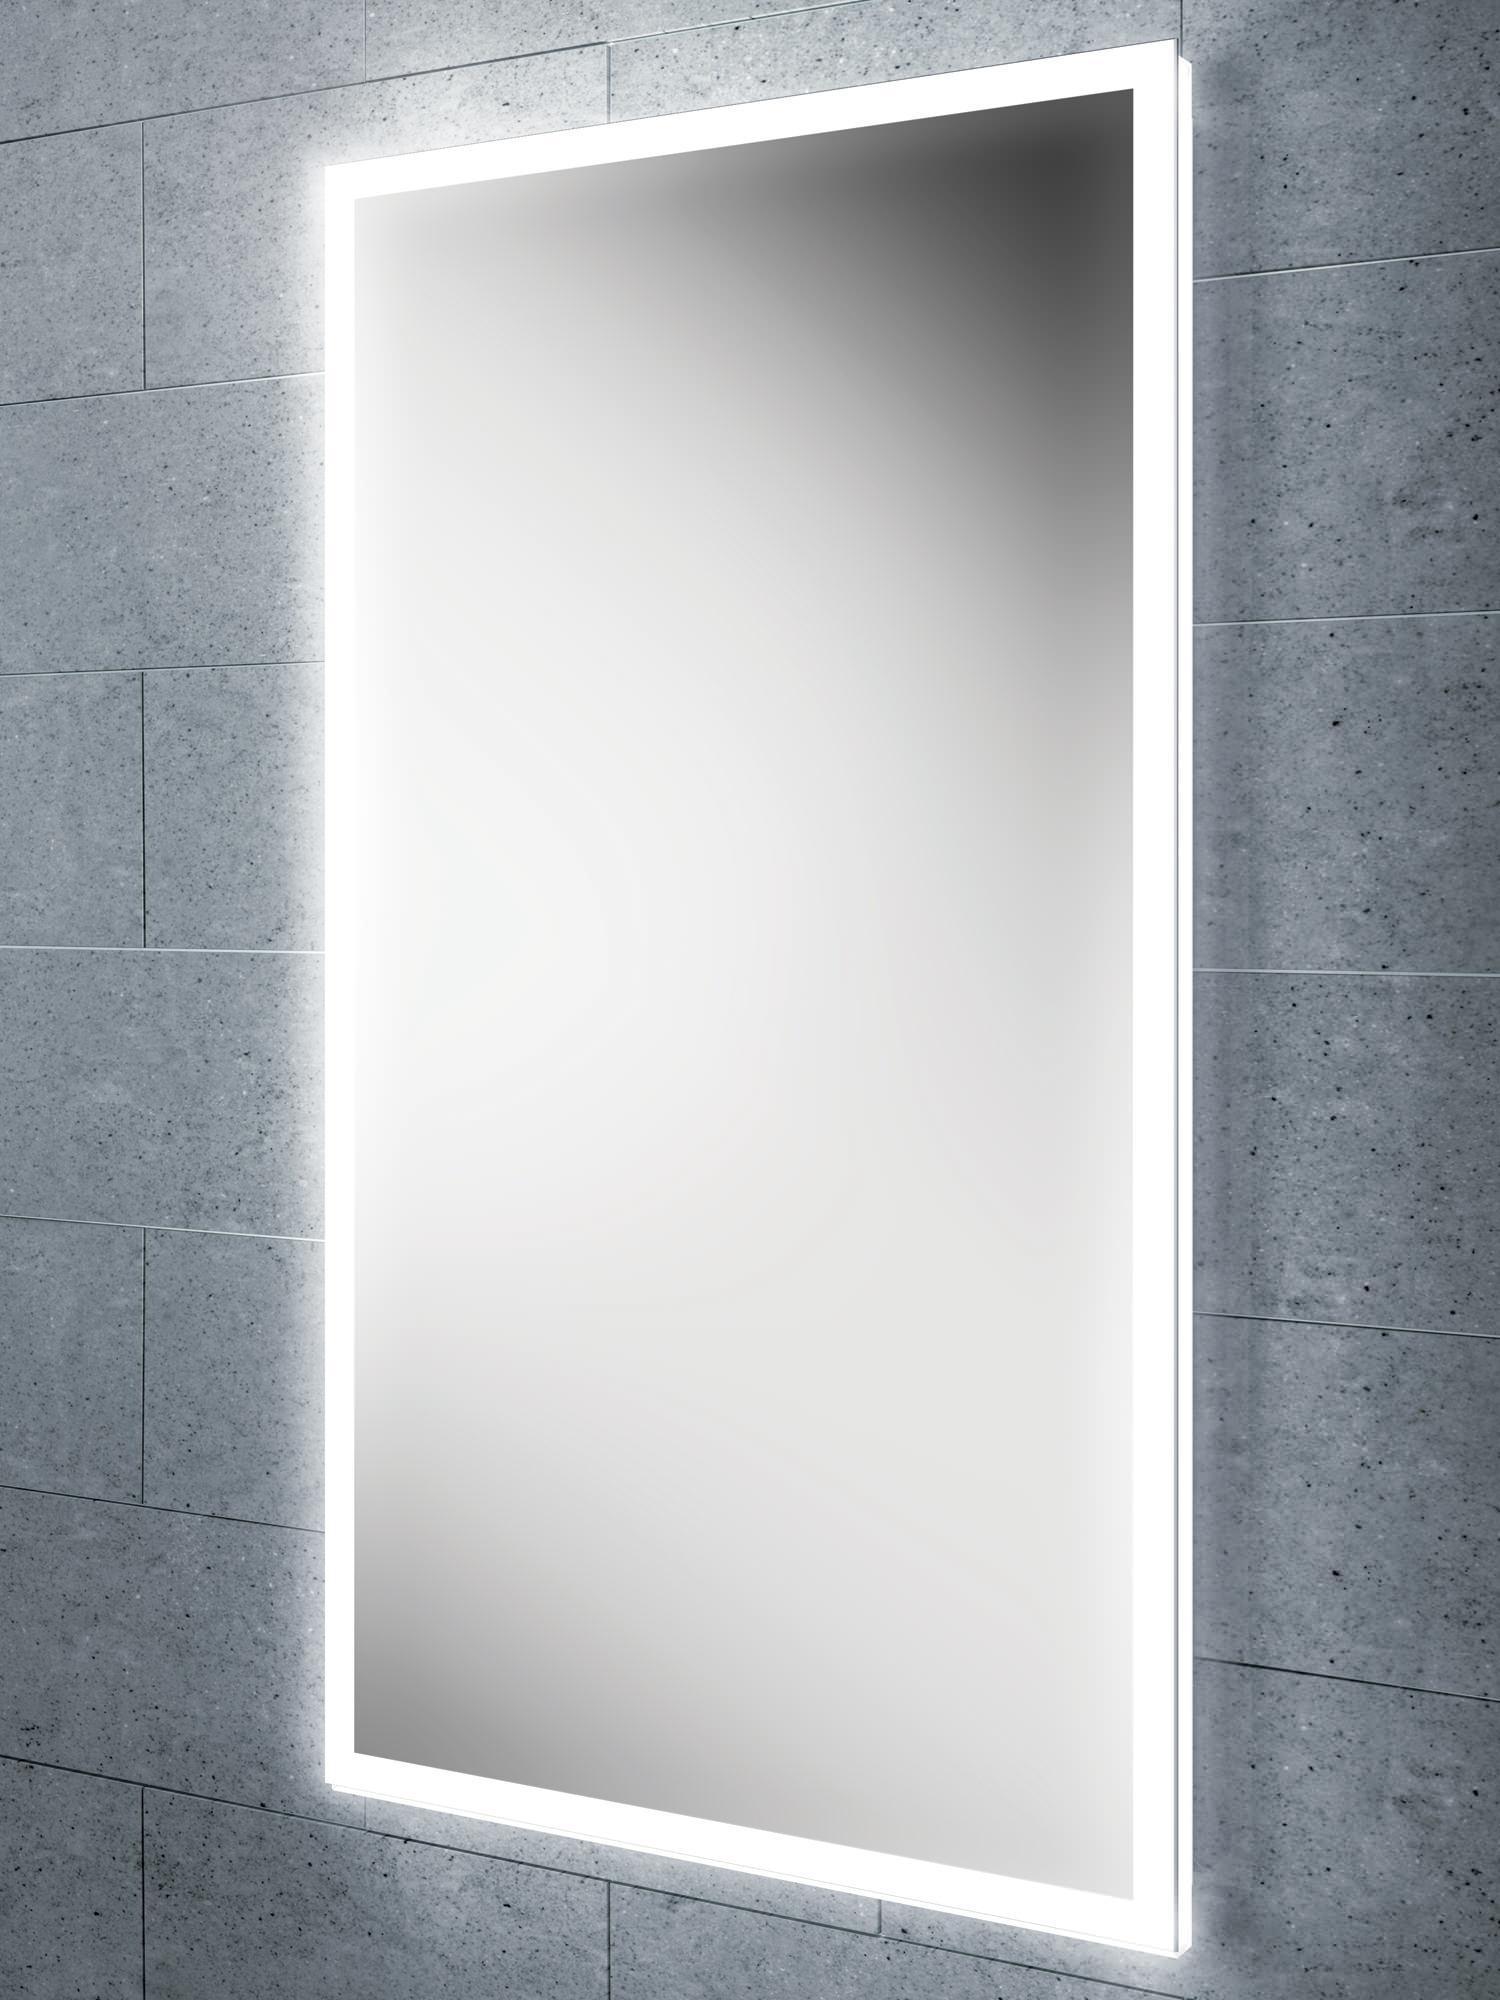 Hib Globe 45 Steam Free Led Illuminated Bathroom Mirror 450X800Mm Inside Led Illuminated Bathroom Mirrors (View 4 of 20)